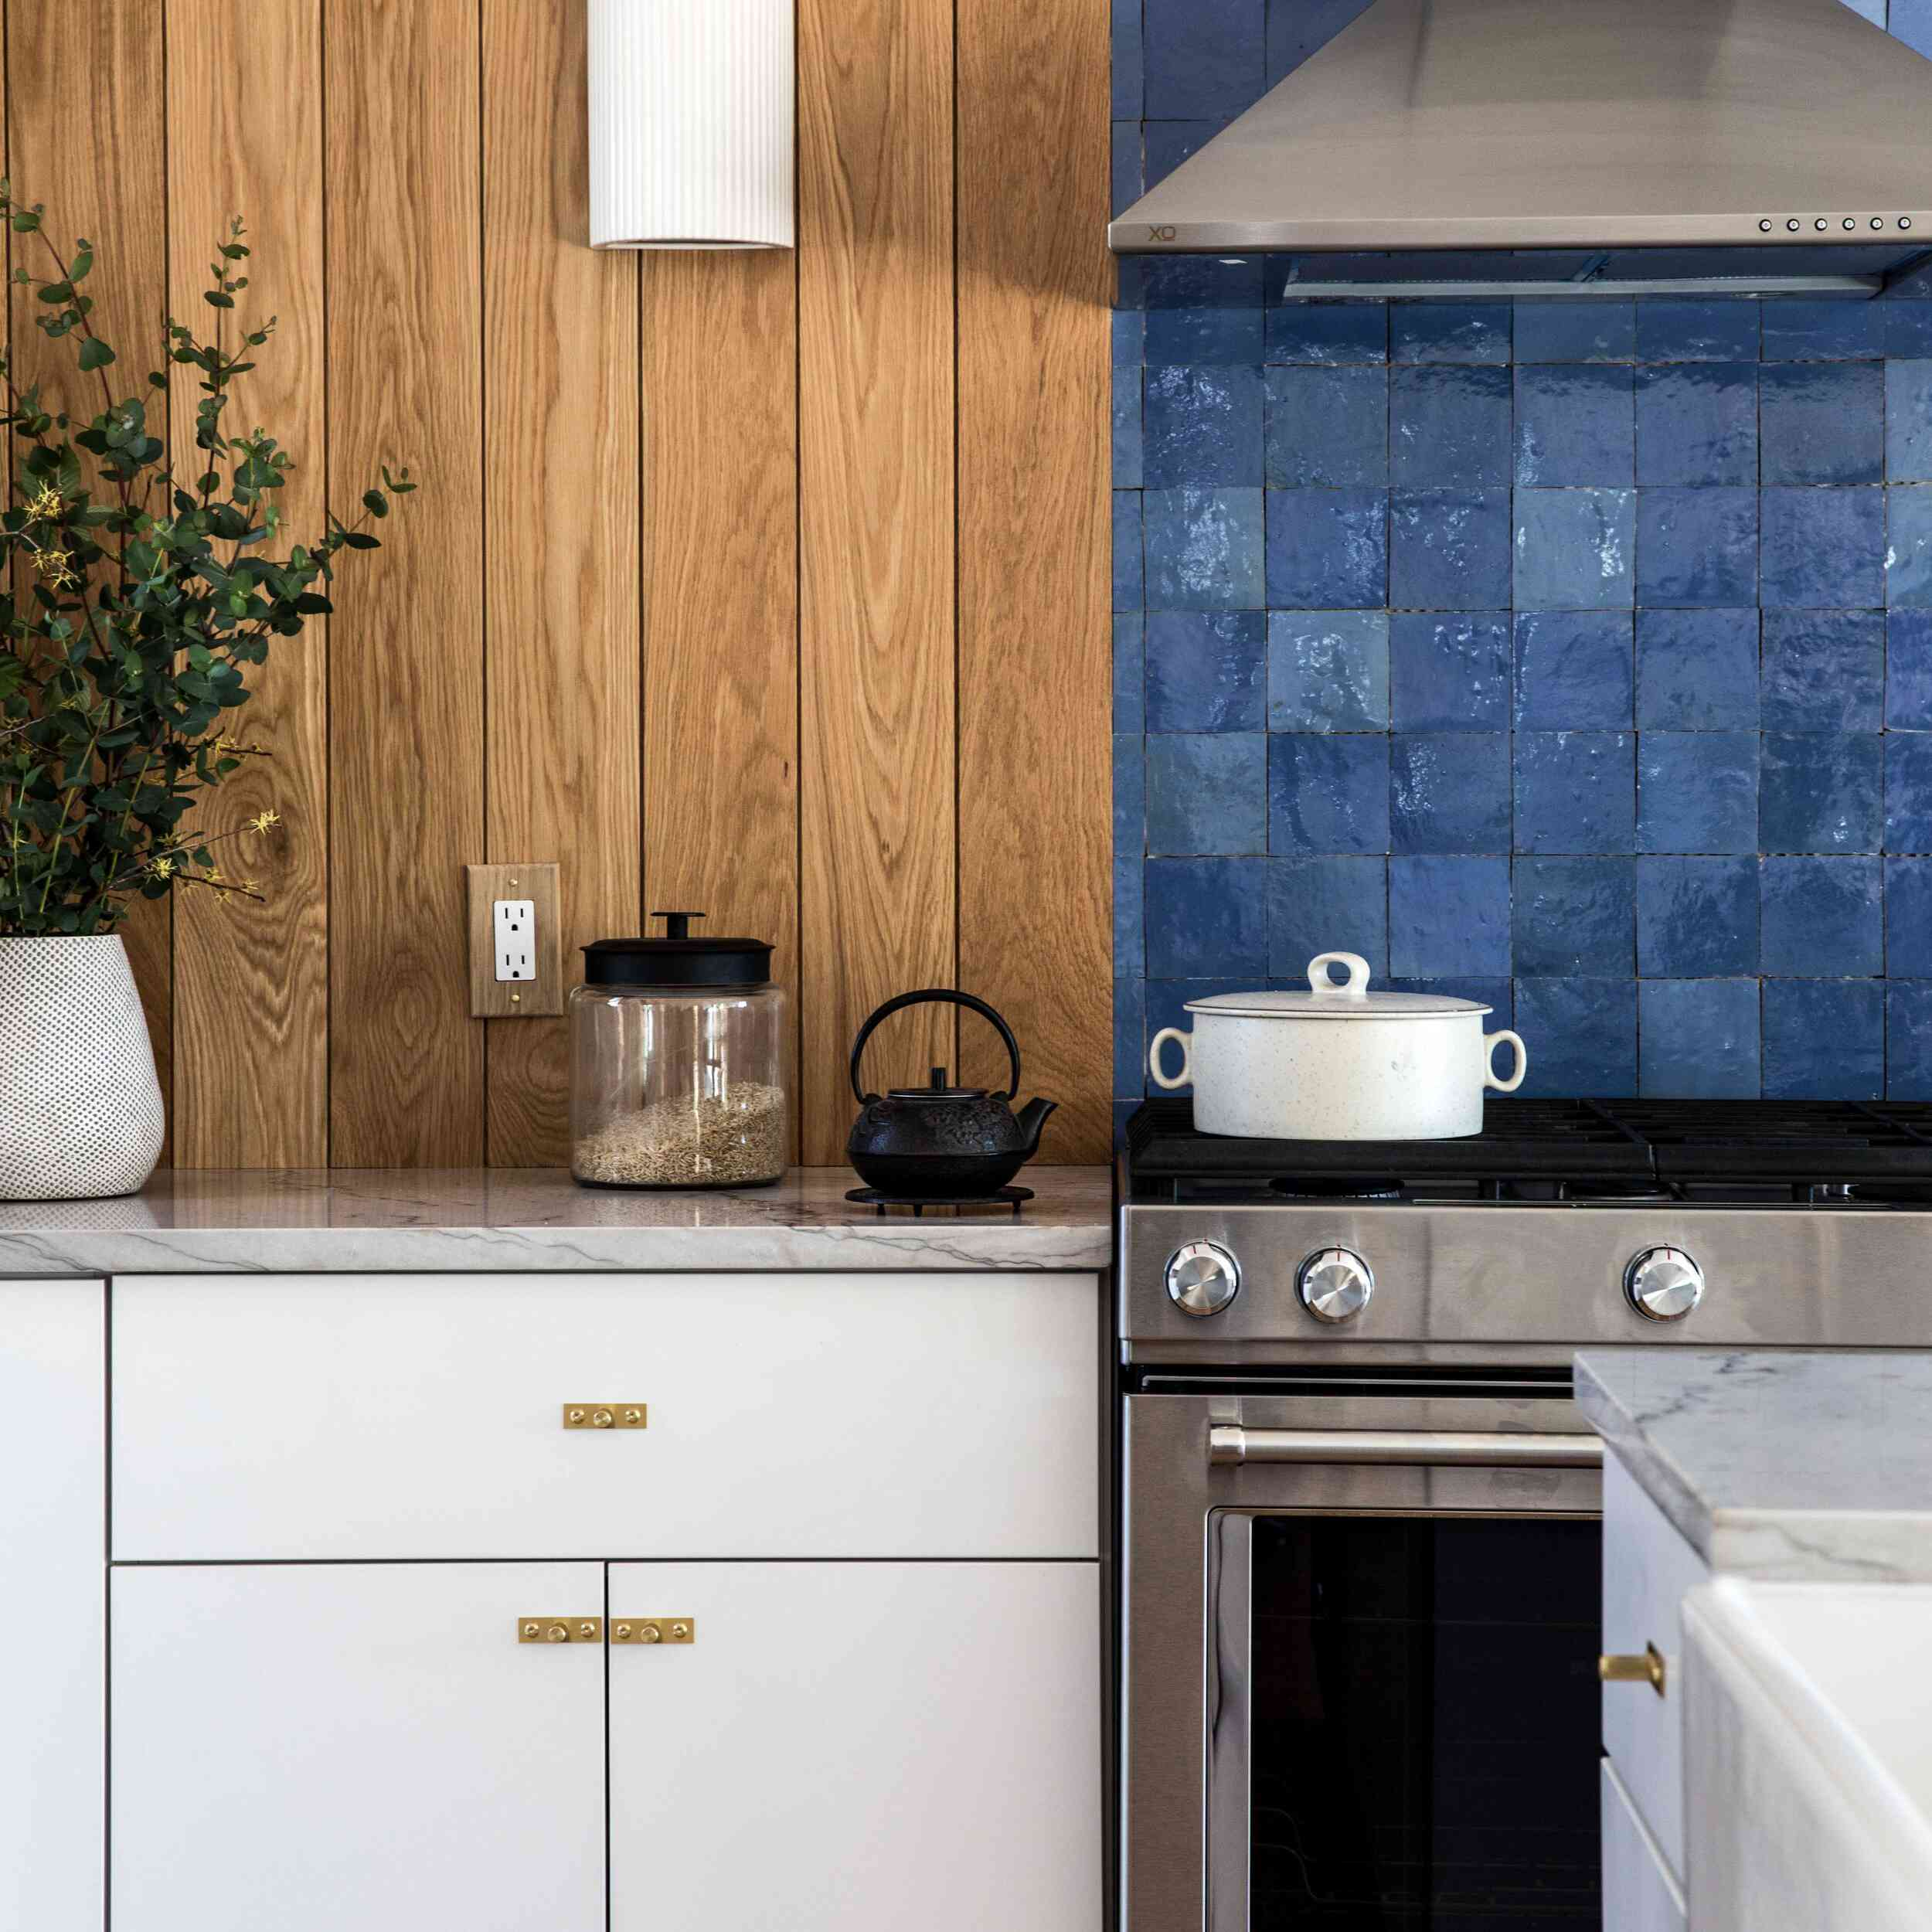 A kitchen with wood-paneled walls and a bright blue backsplash